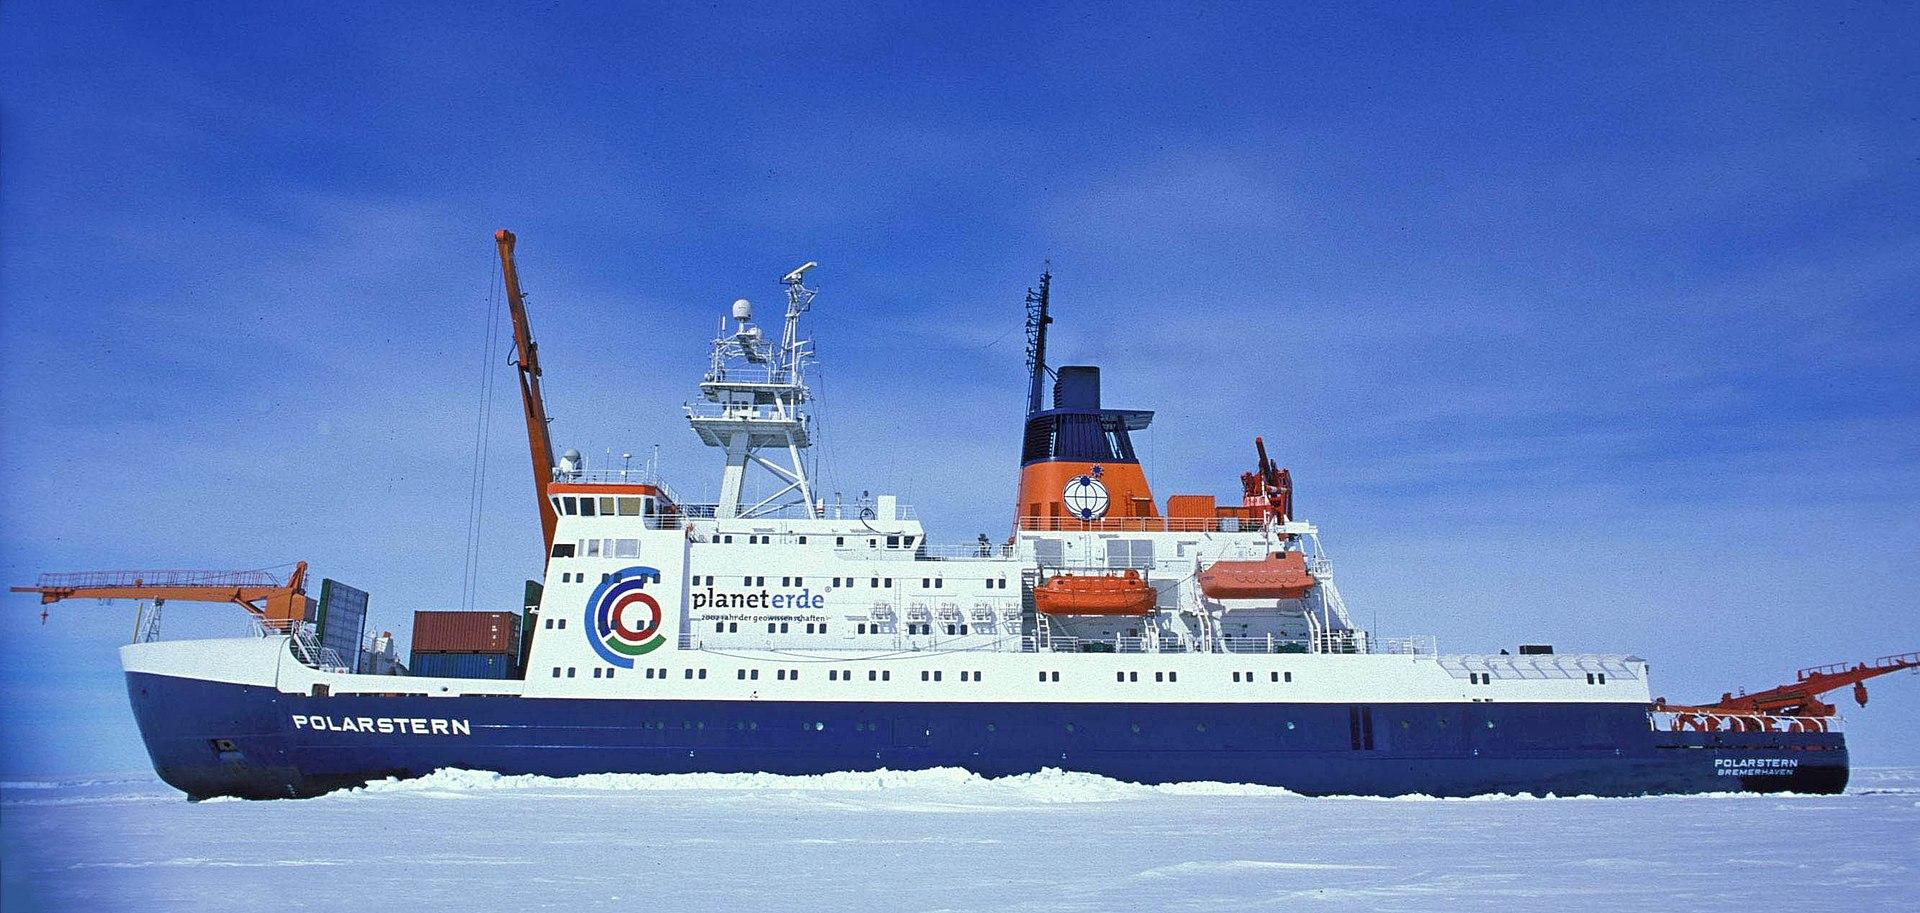 Polarstern awi hg.jpg